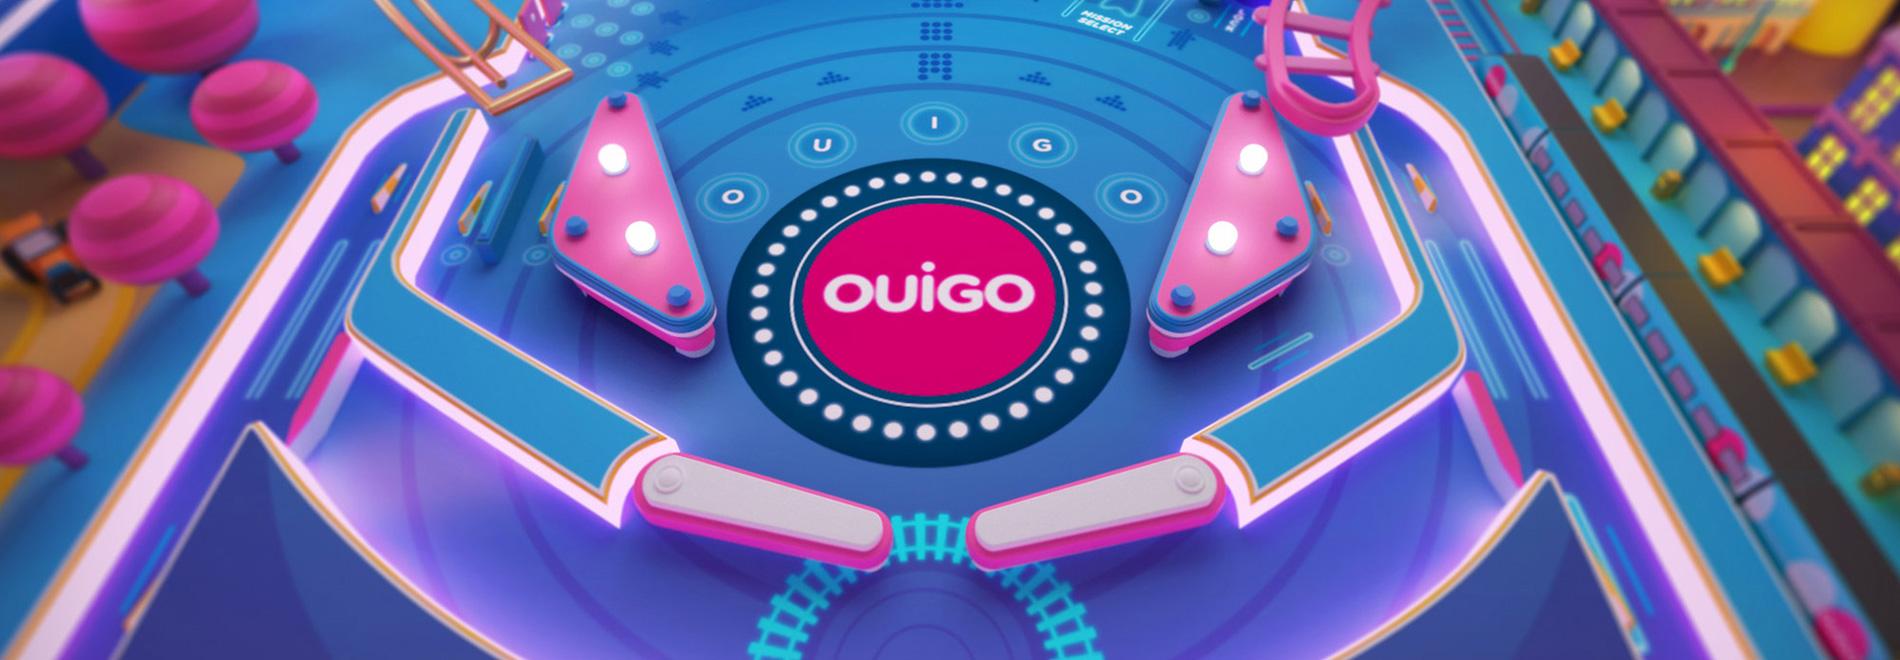 Case Study: Merci - Michel & Rosapark Win SOTM June With Ouigo Let's Play!